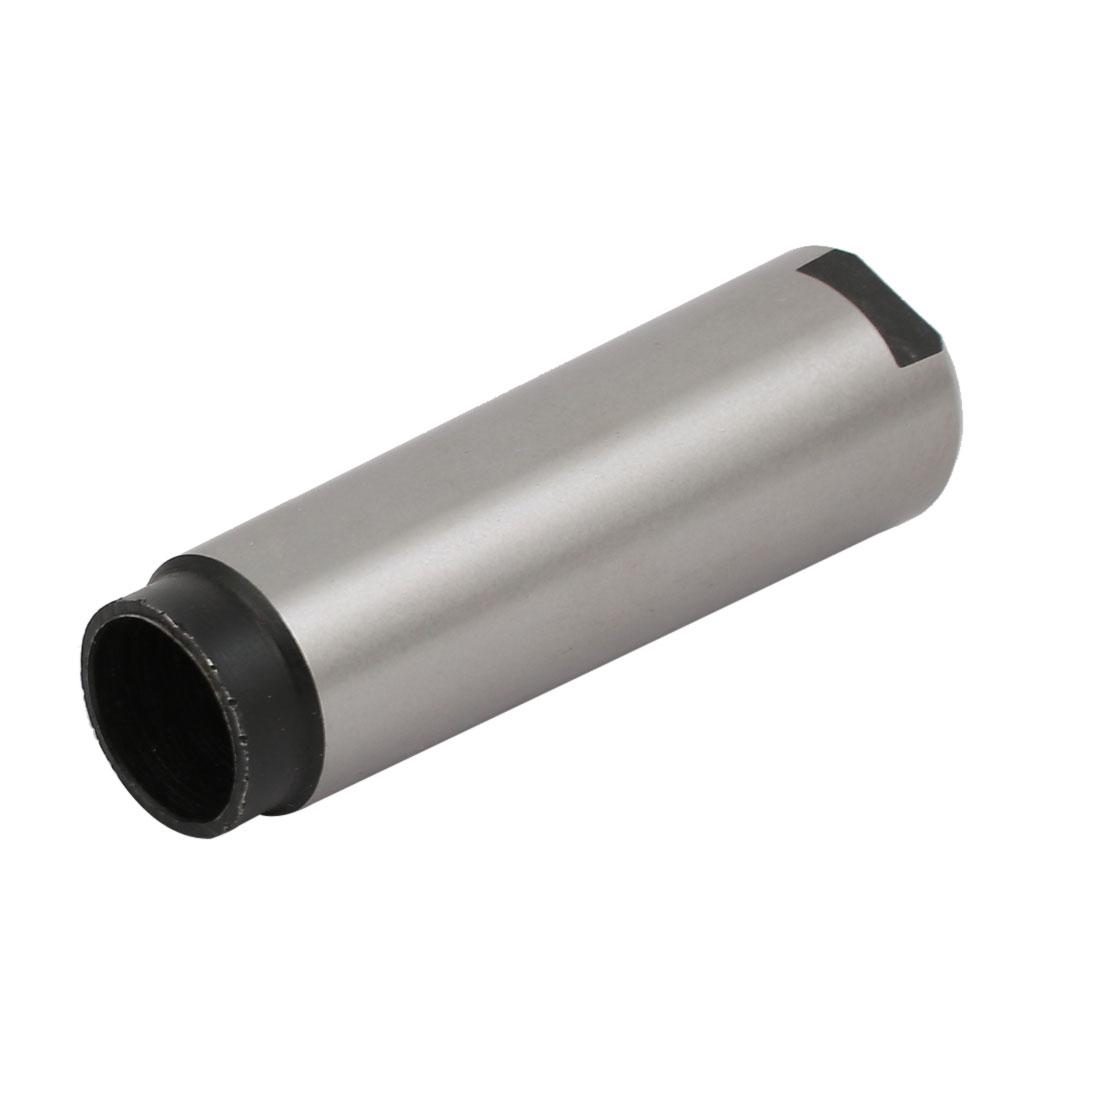 MT2-MT3 Lathe Drill Morse Taper Center Sleeve Adapter